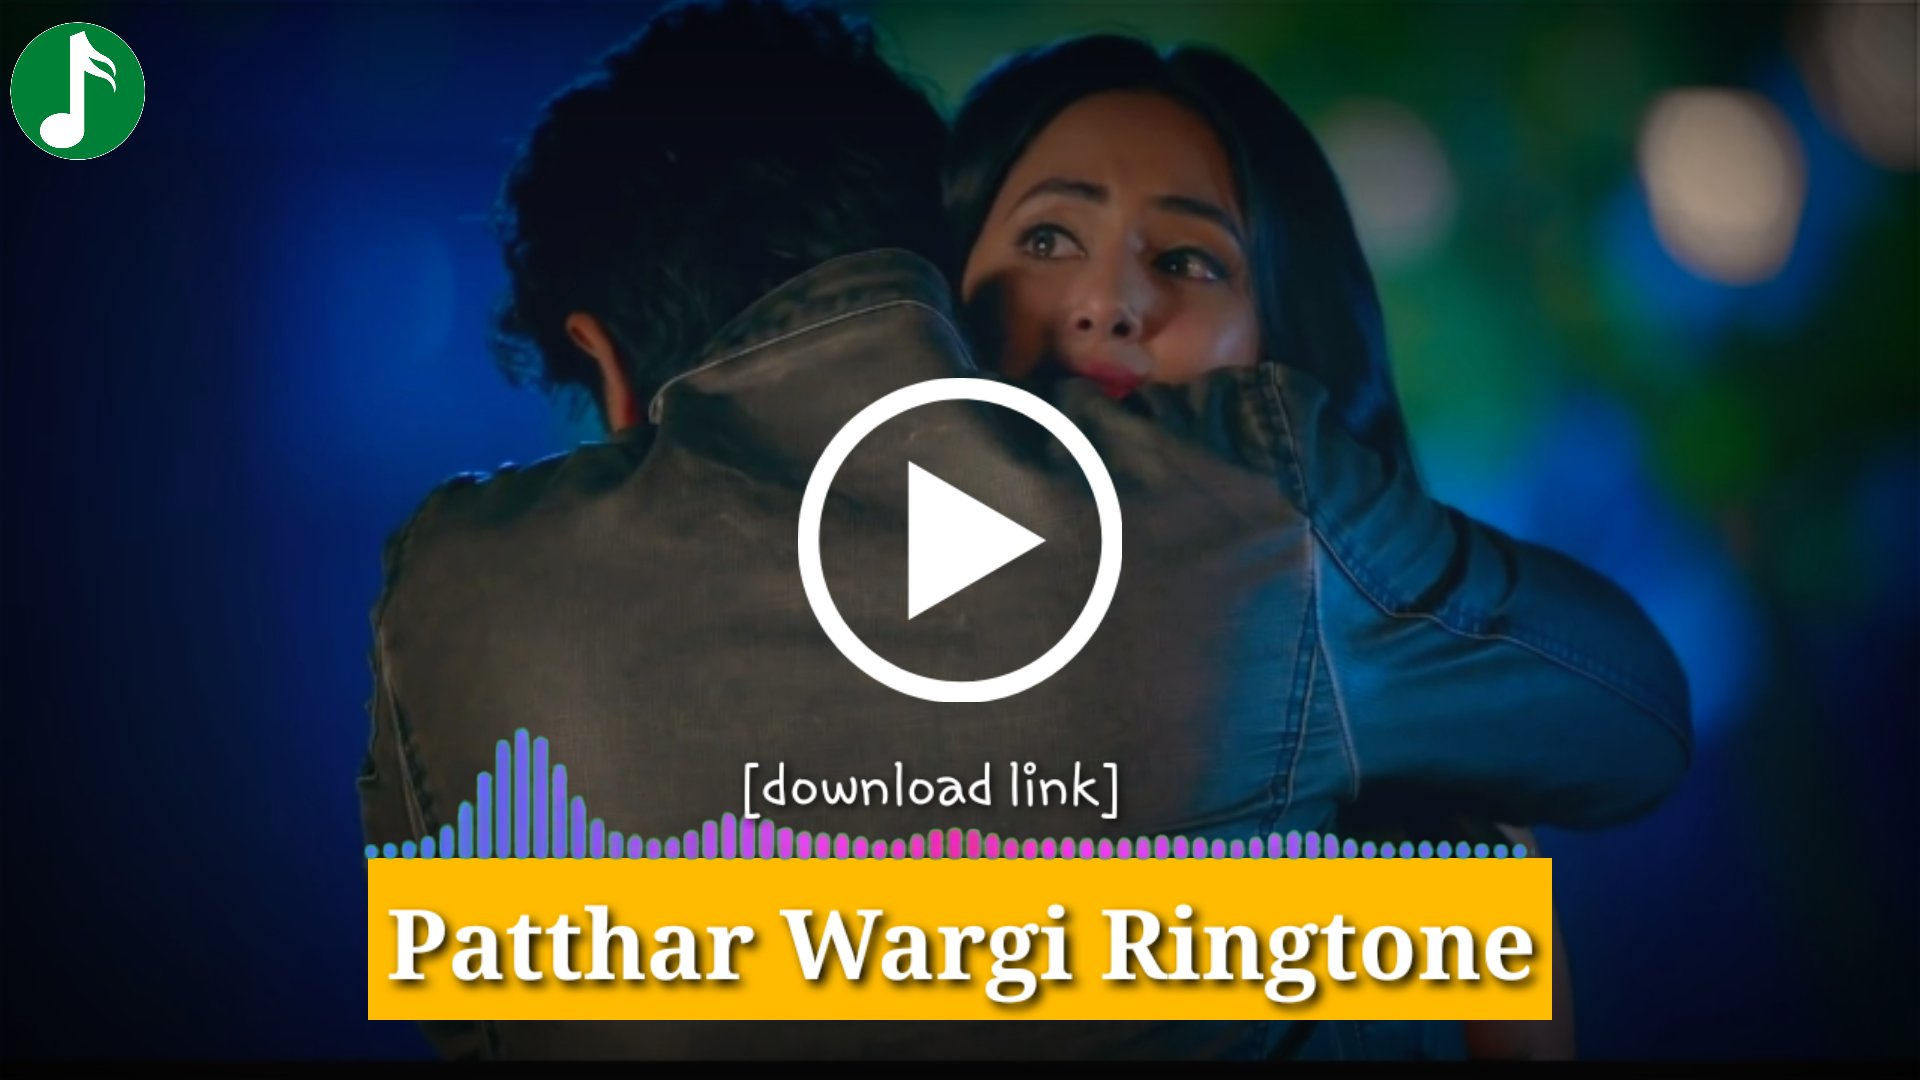 Patthar Wargi Mp3 Ringtone Download